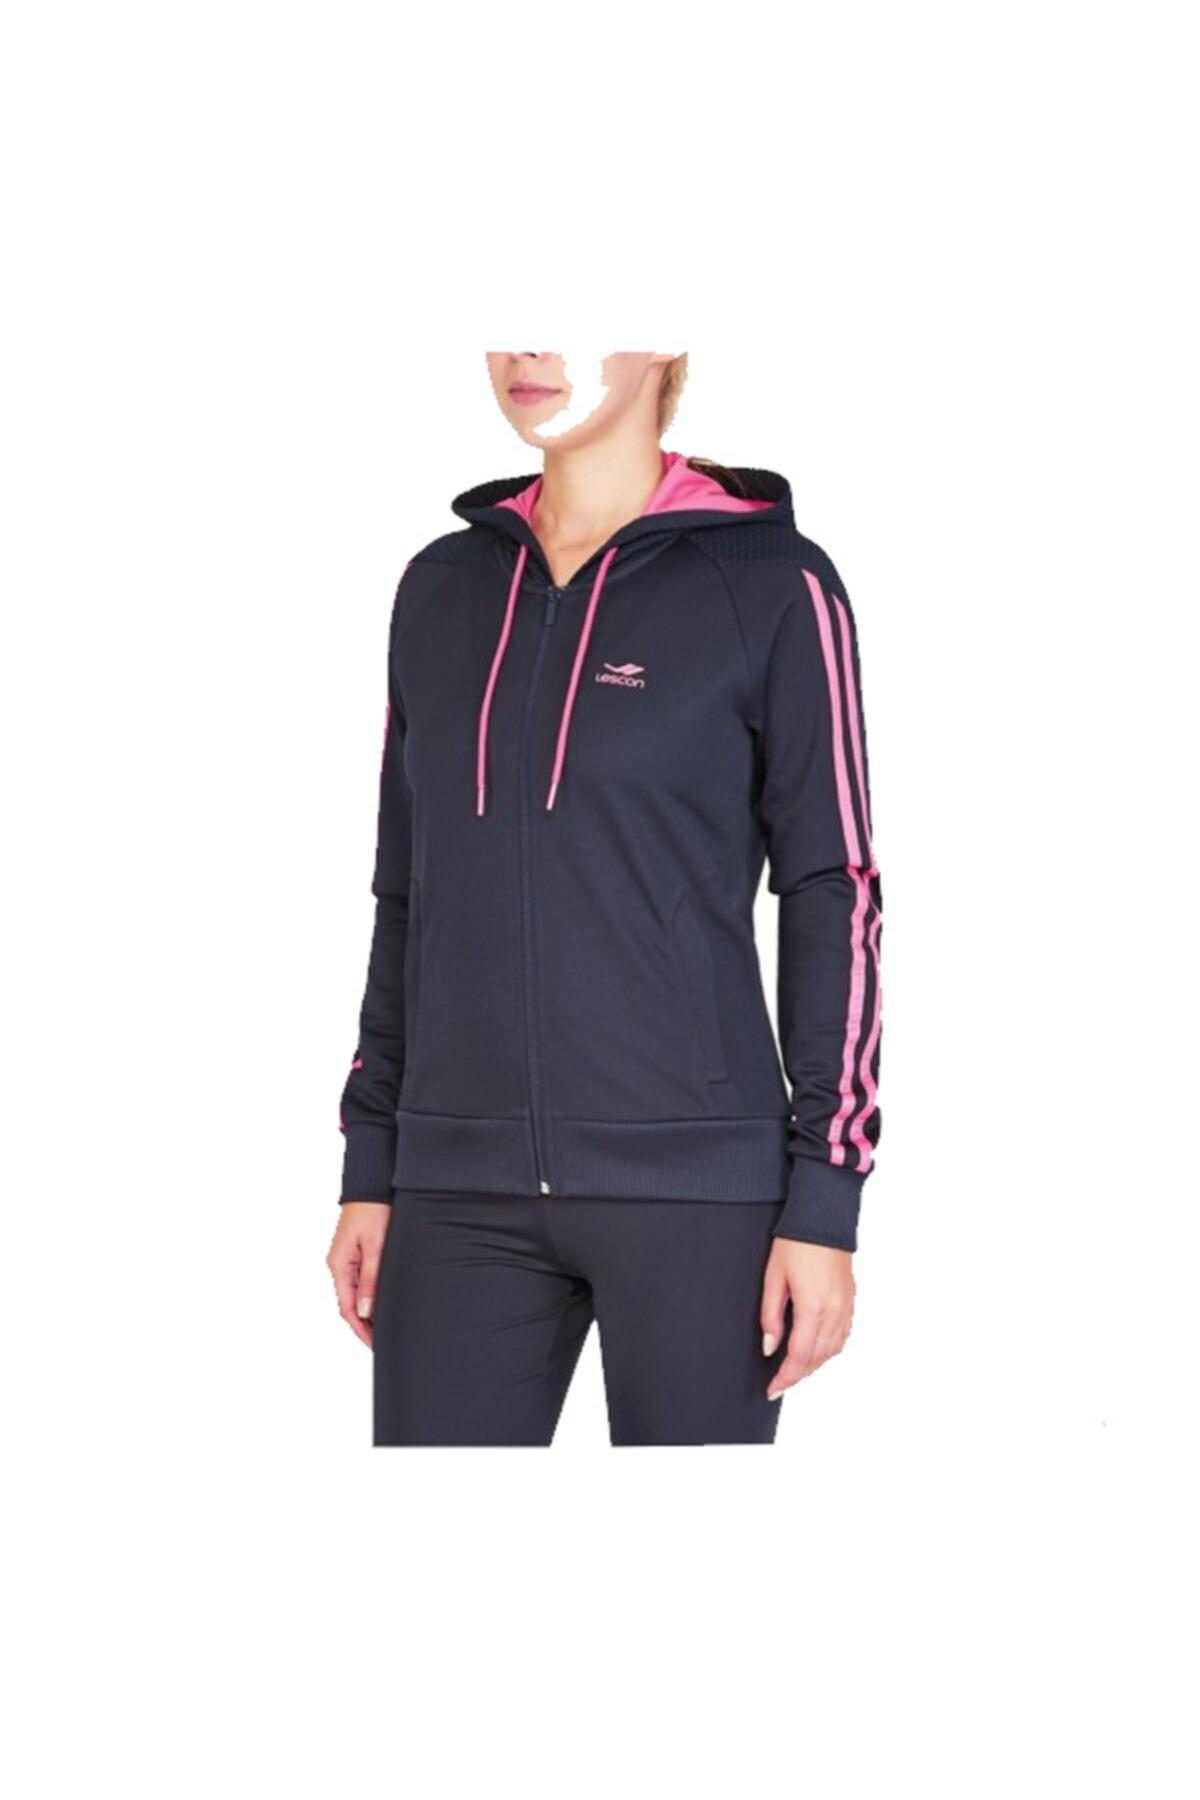 Lescon Kadın Lacivert Sweatshirt 15n-2106 1